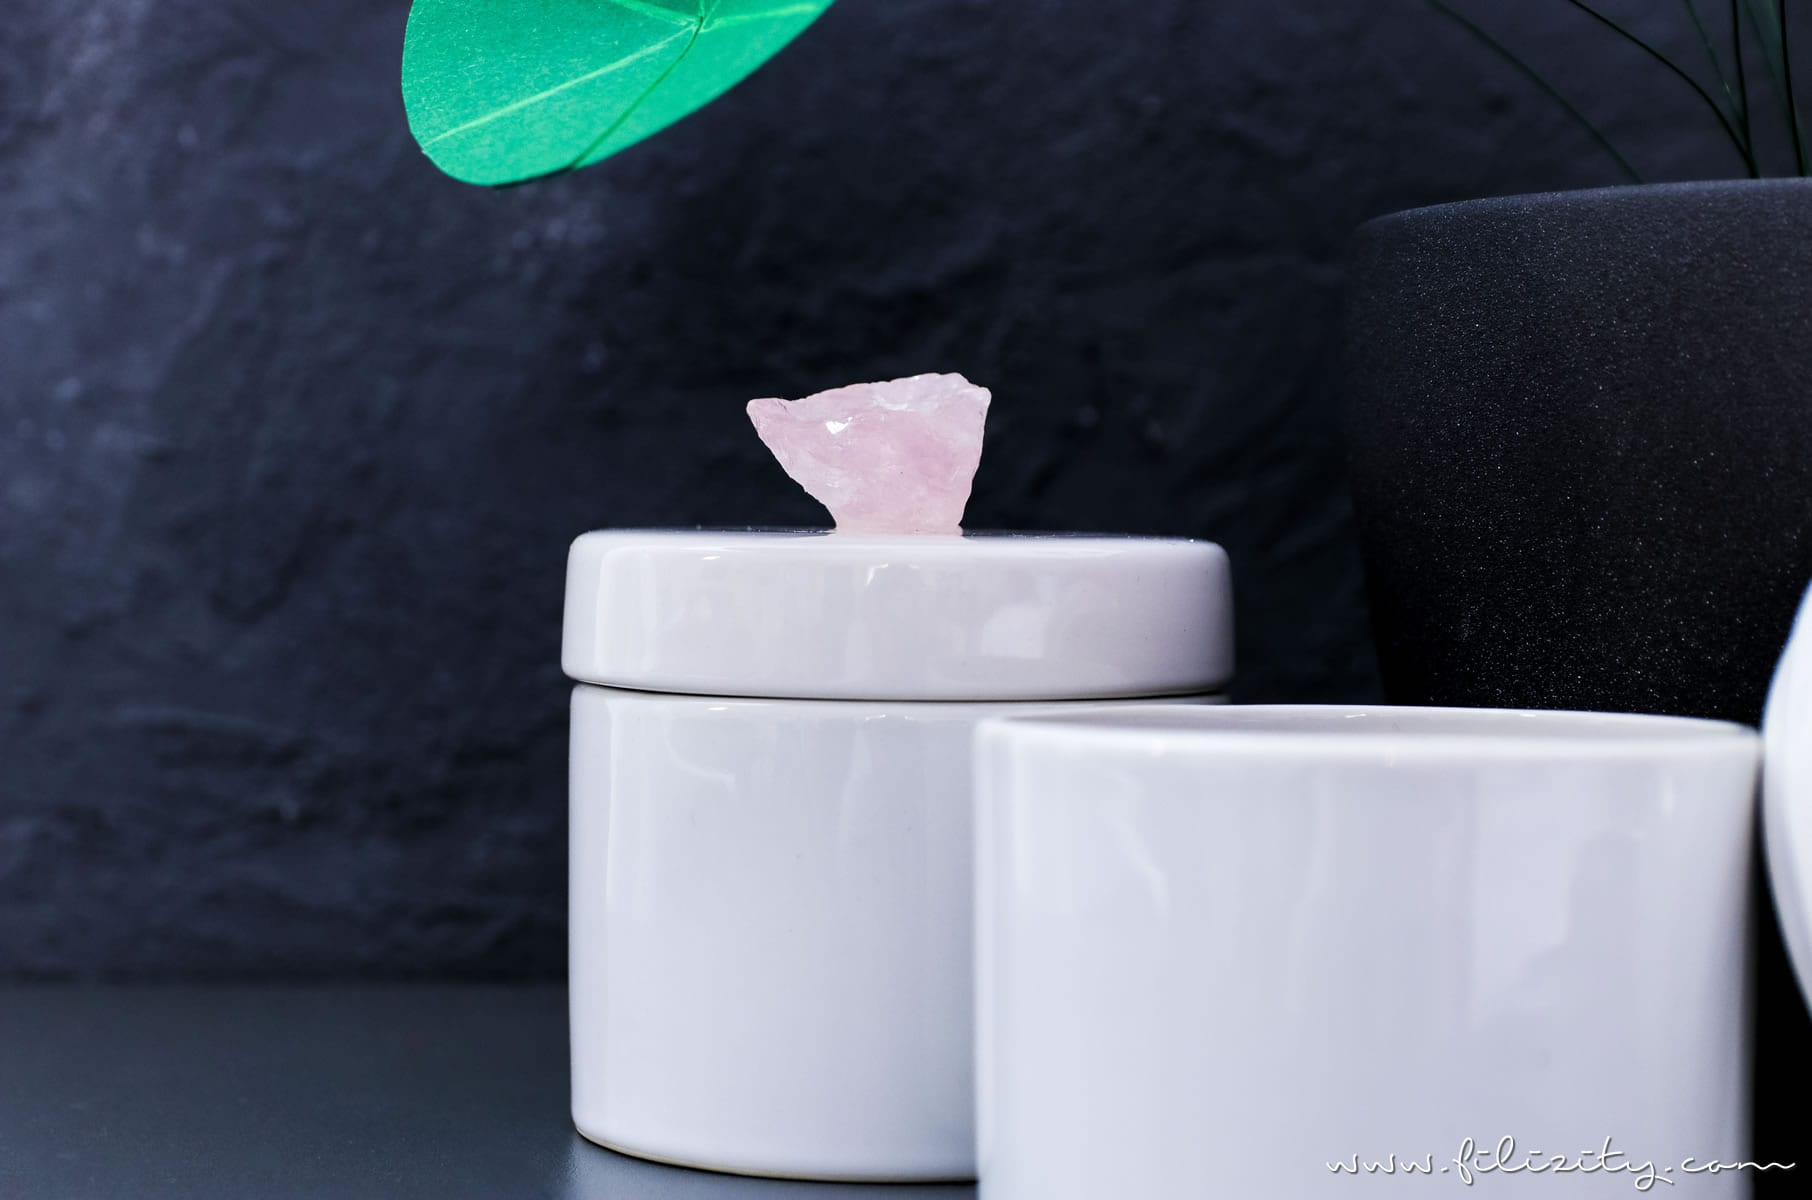 luxus deko selber machen diy kristalldosen. Black Bedroom Furniture Sets. Home Design Ideas